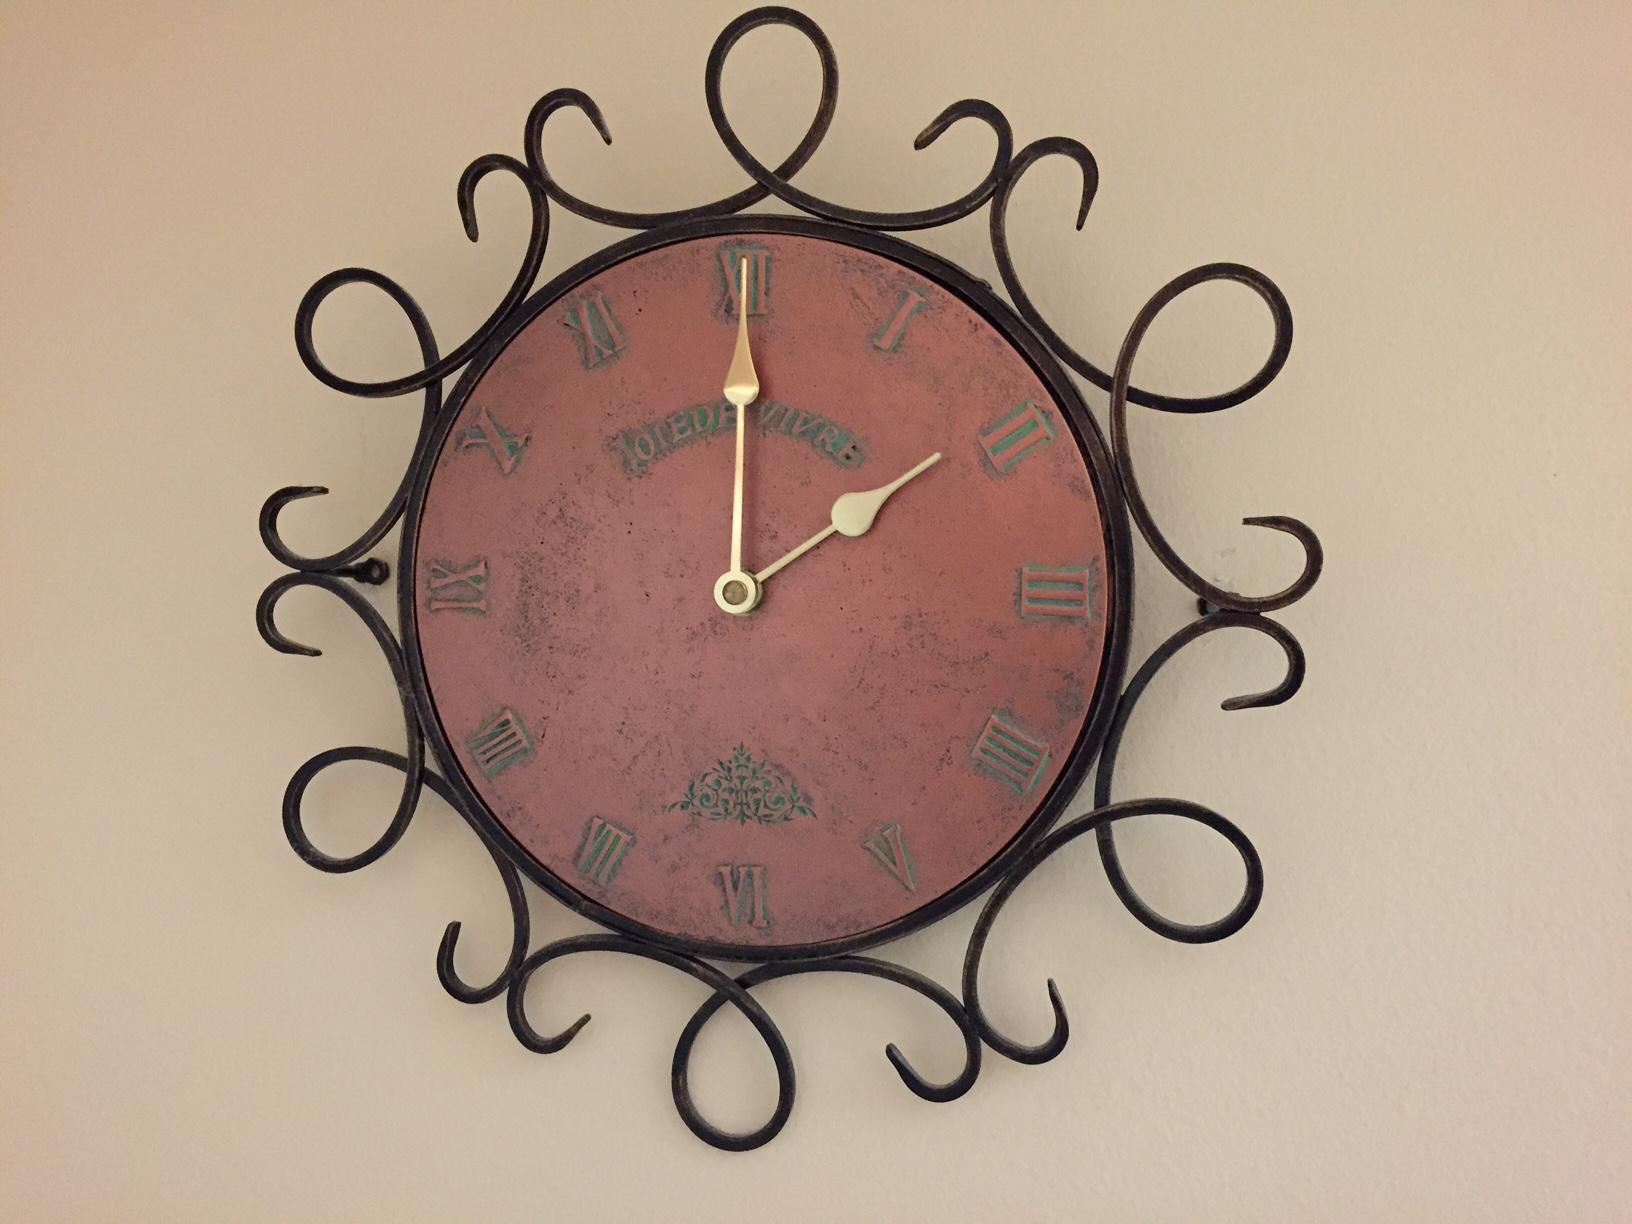 Daylight Savings Time Us Virgin Islands